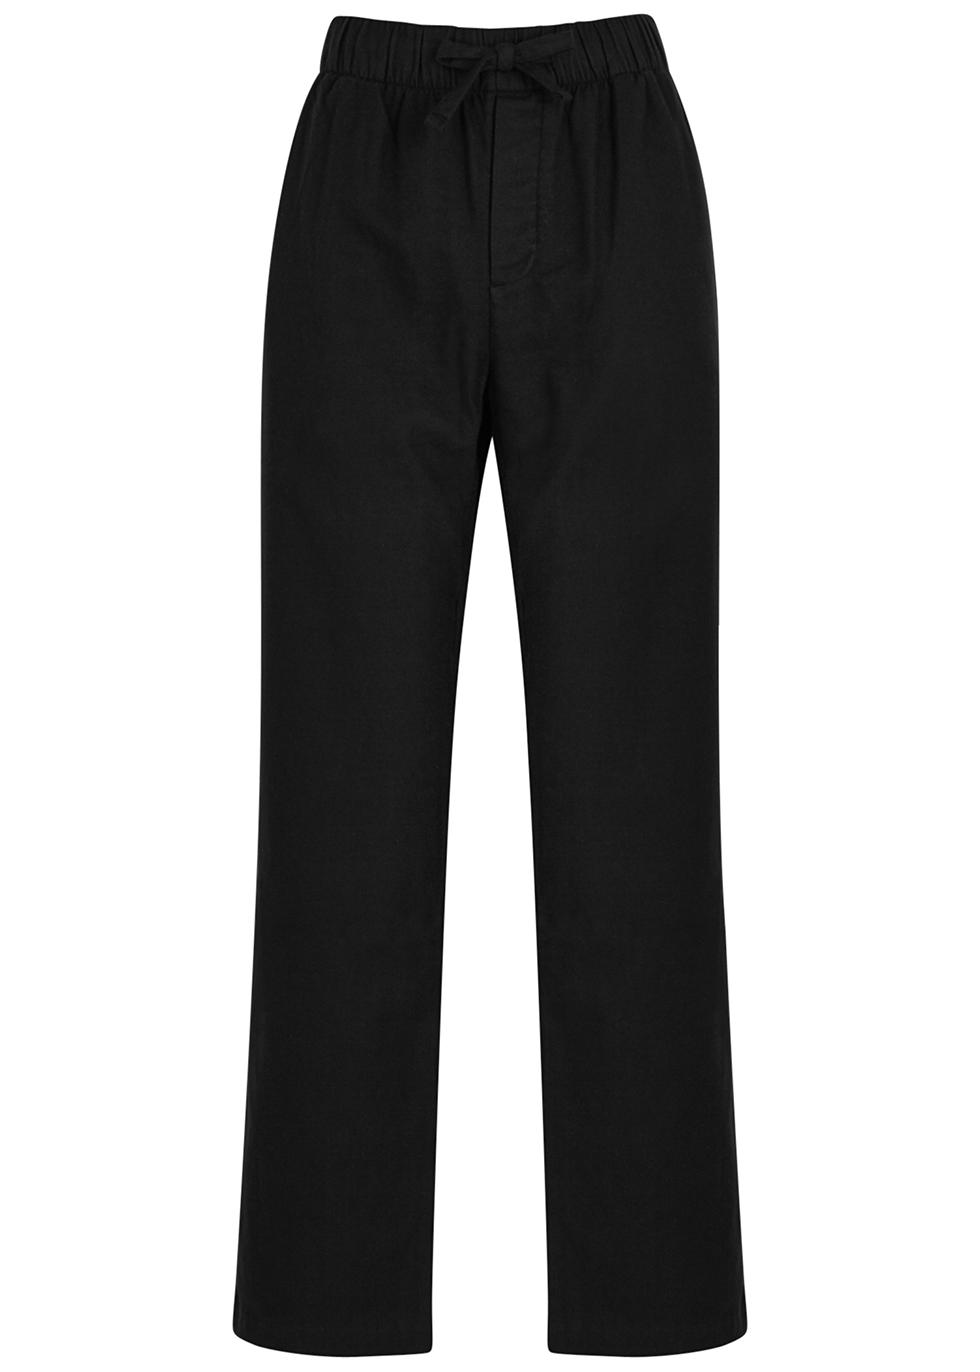 Unisex off-white flannel pyjama trousers